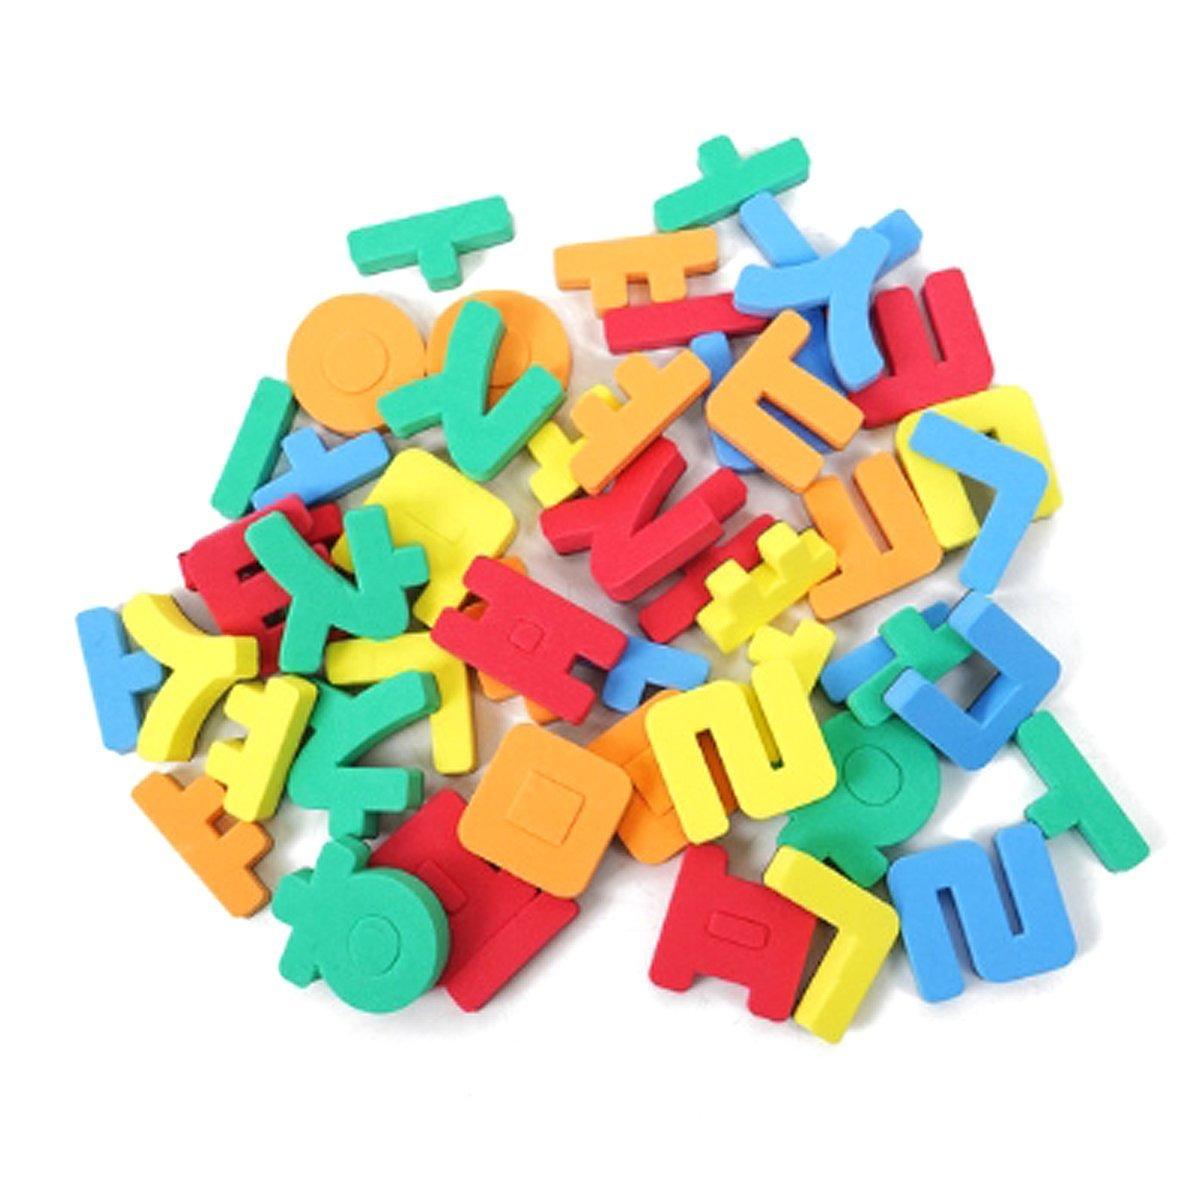 26982e611 Get Quotations · Rubber Magnets Educational Toy Korean Alphabet Hangul